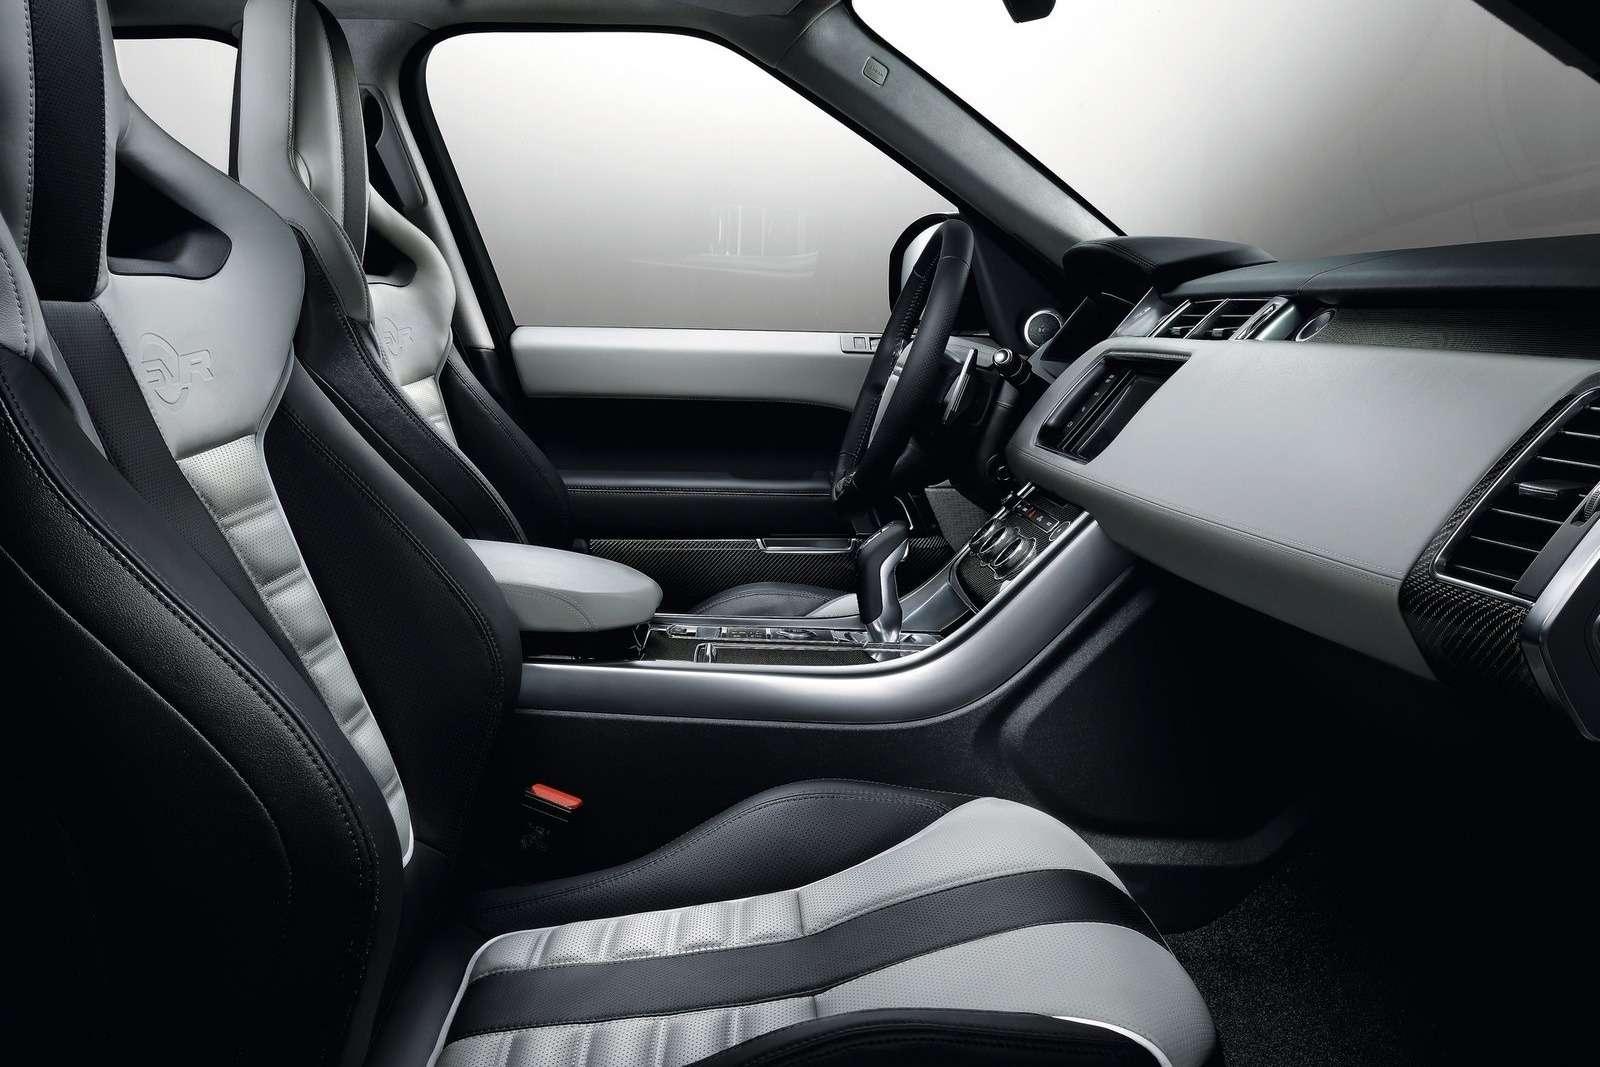 Land_Rover-Range_Rover_Sport_SVR_2015_1600x1200_wallpaper_1b